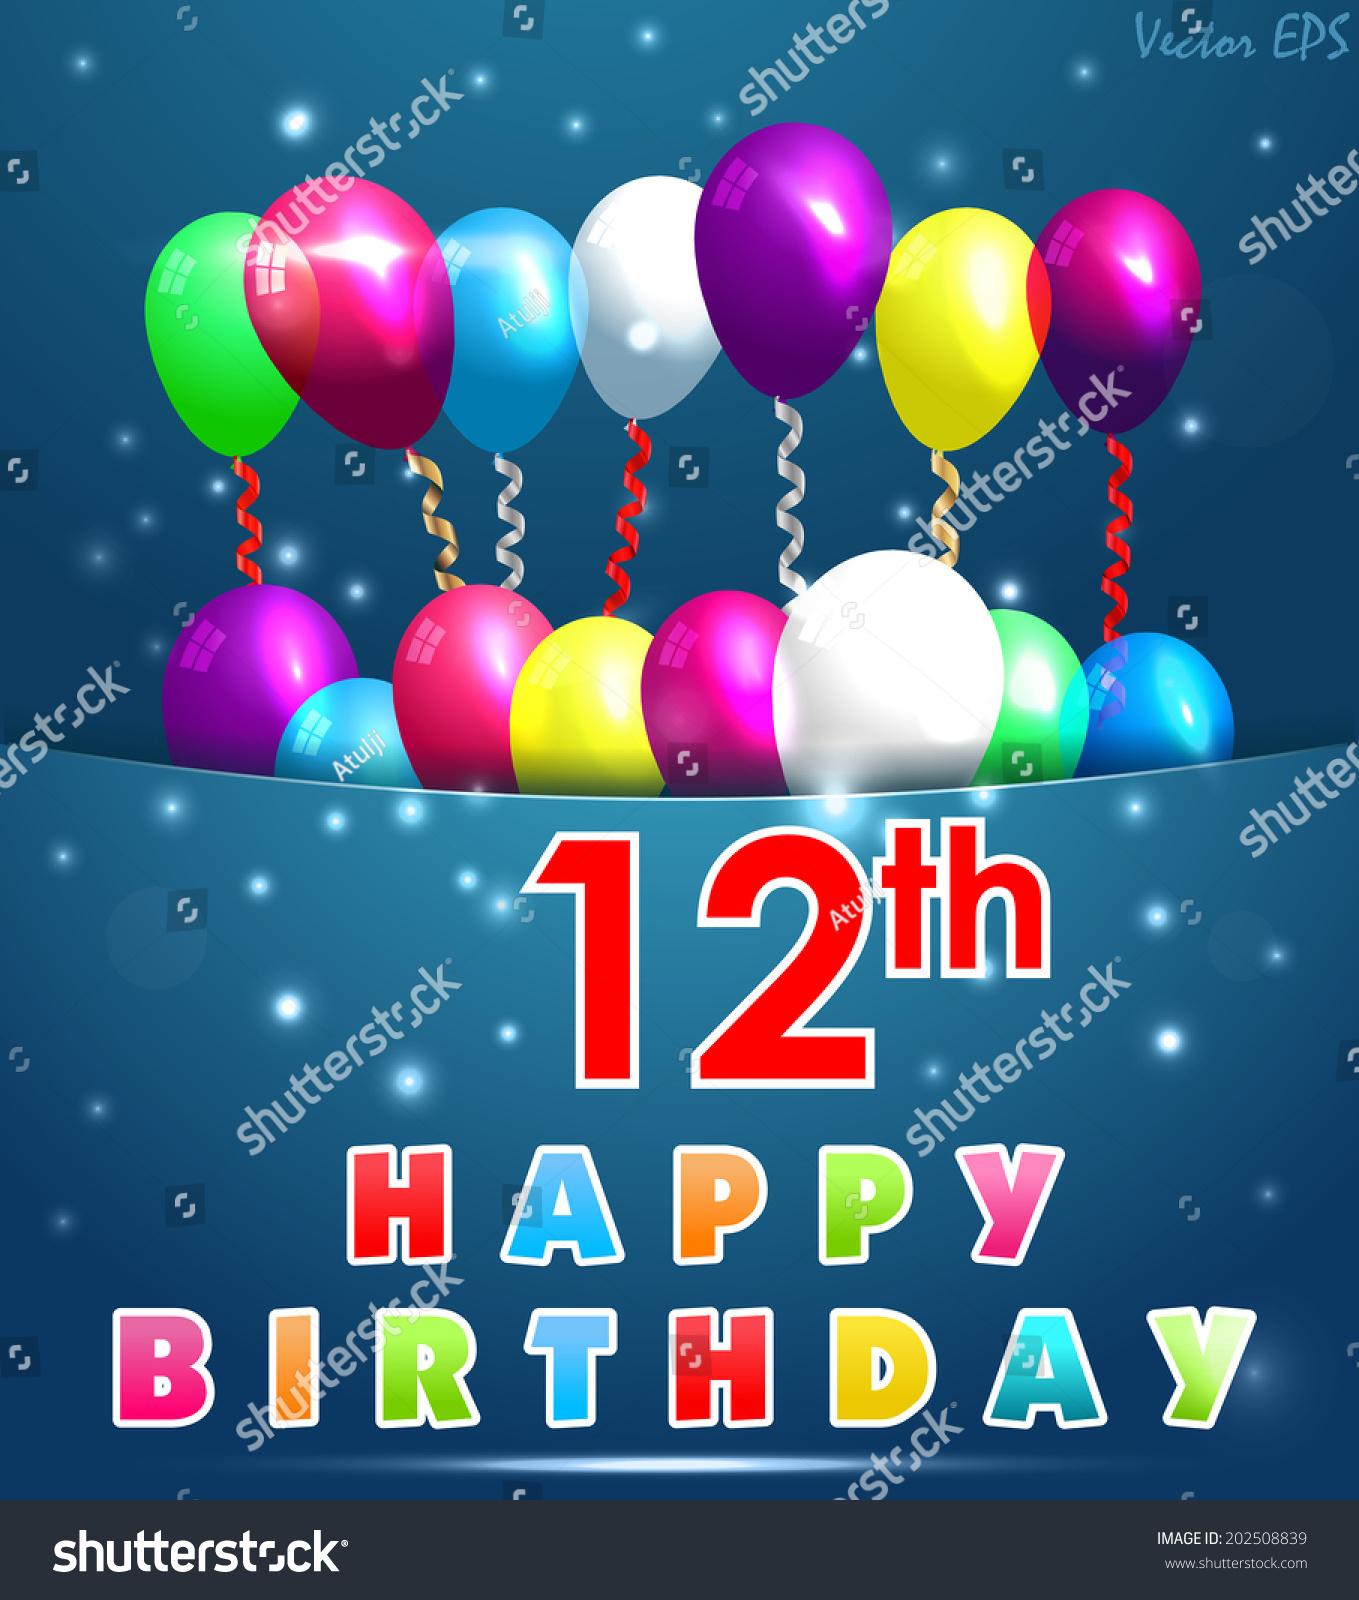 12 Year Happy Birthday Card Balloons Vector 202508839 – 12th Birthday Cards